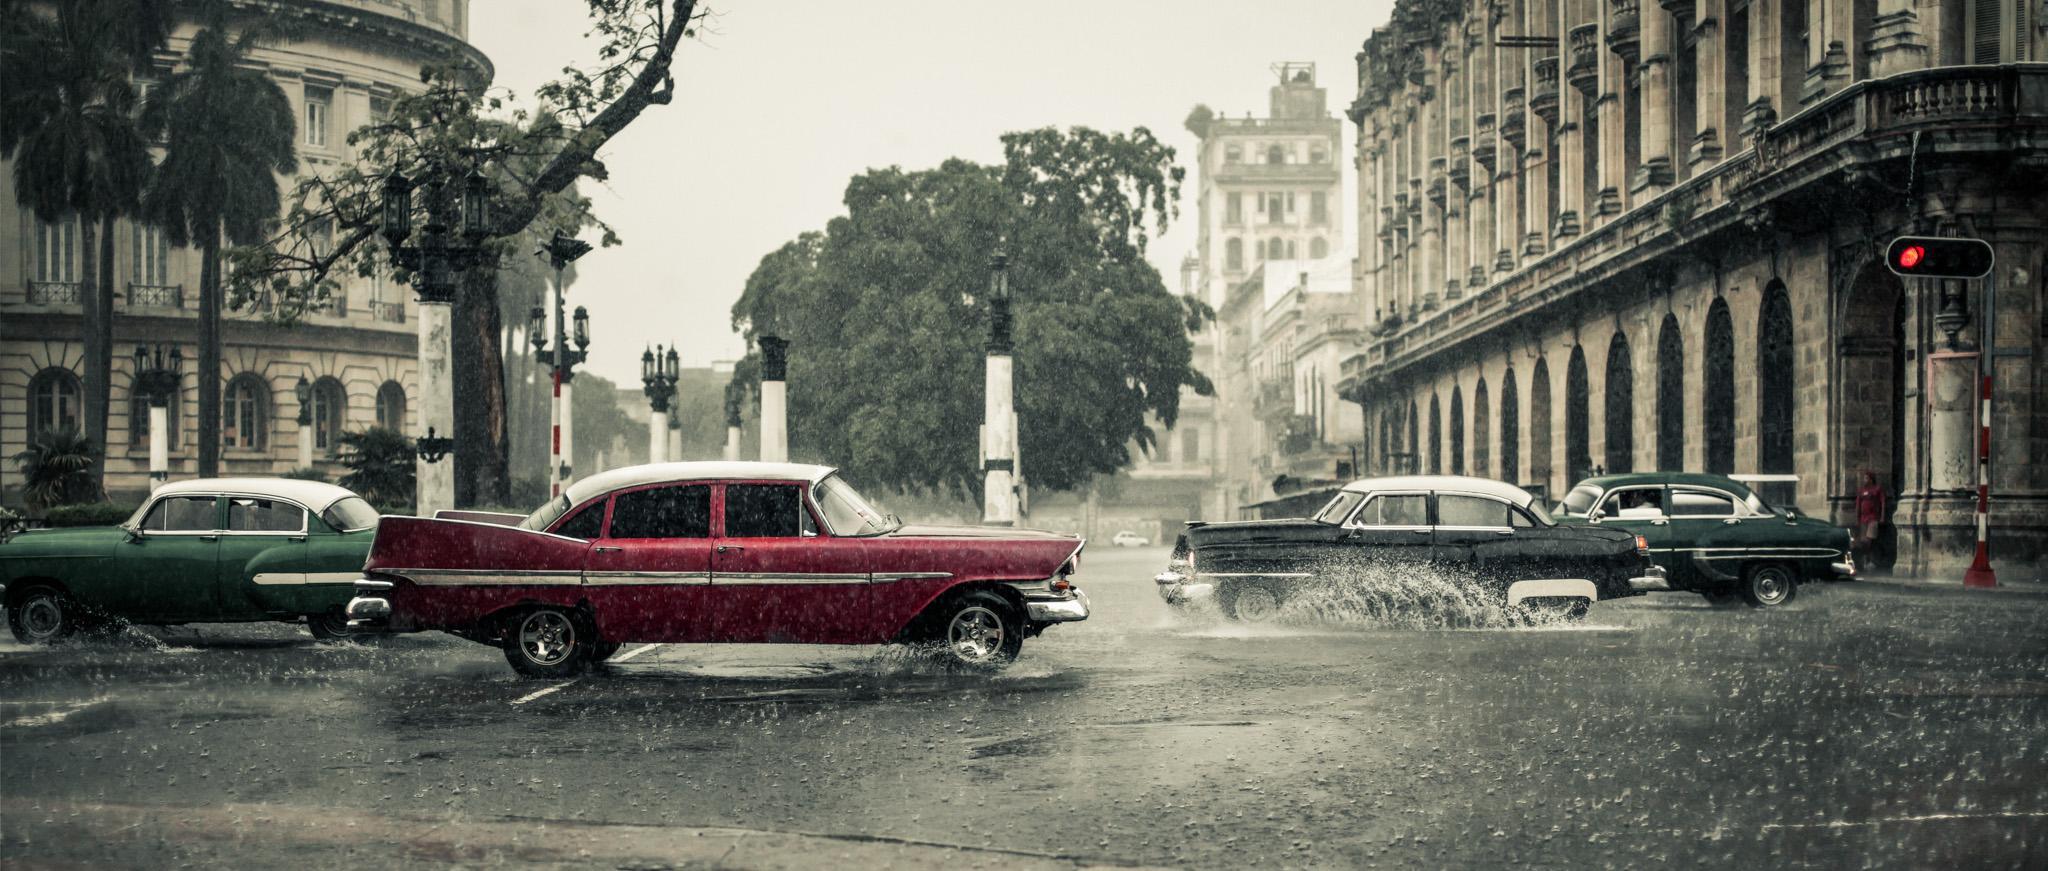 Cuba - Ruby Red.jpg